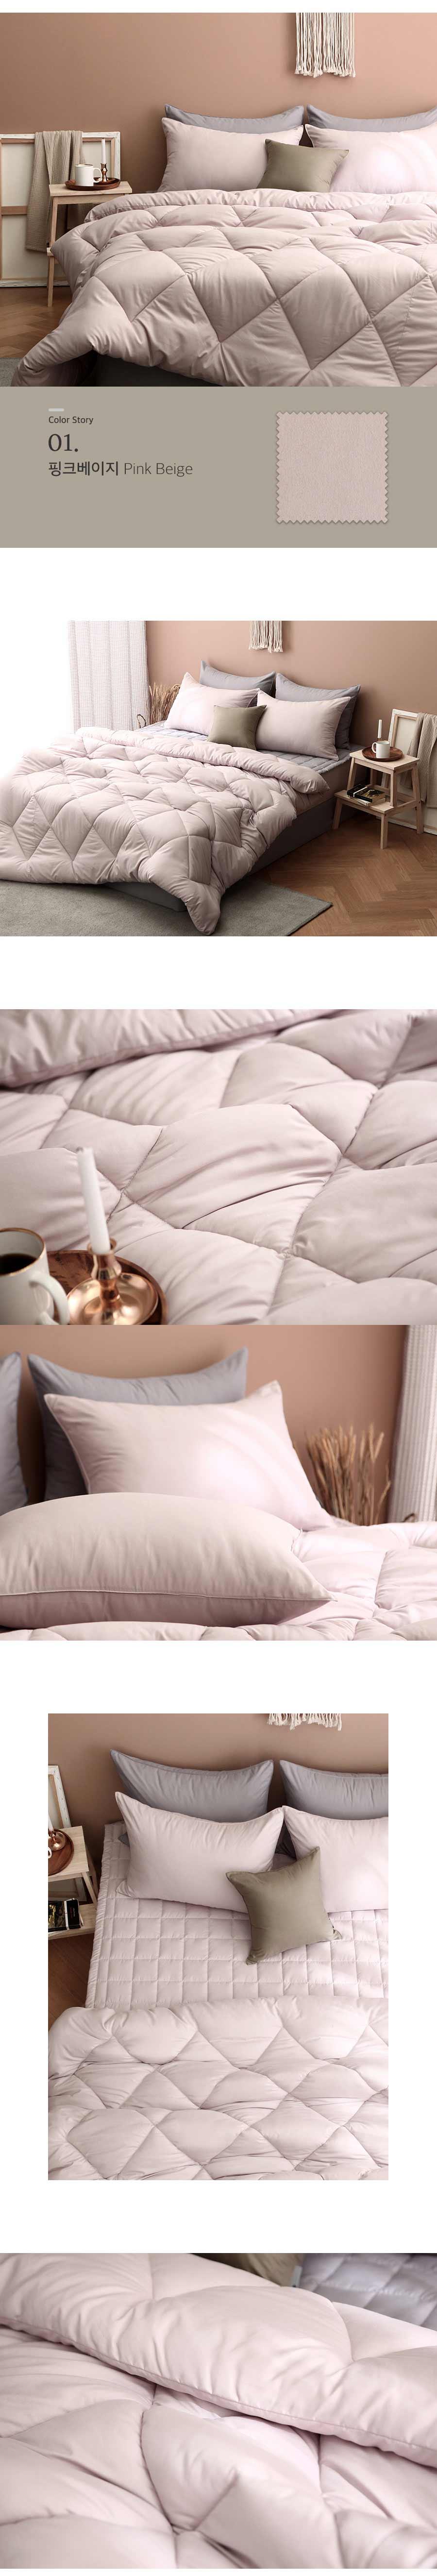 Rising Comforter Pillow cover set 1